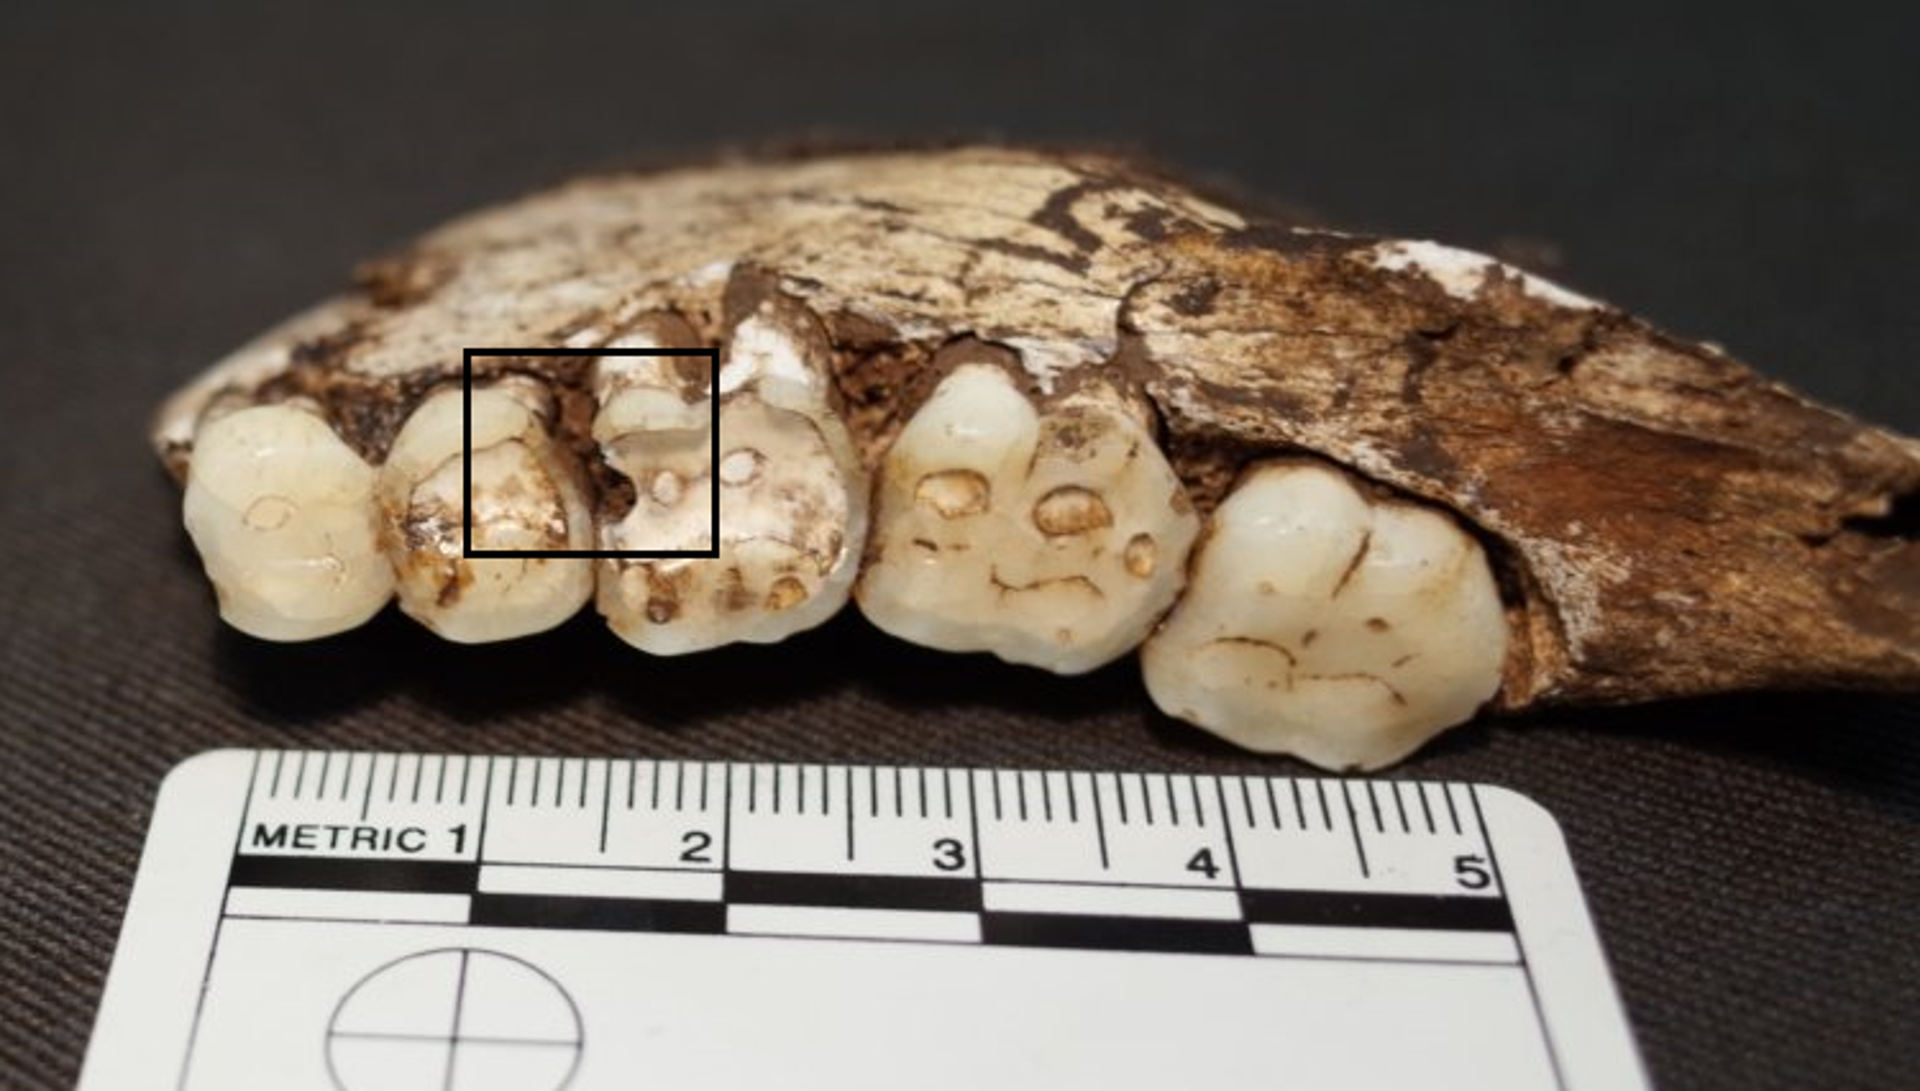 Carious lesions on the mandibular right second premolar and first molar. Homo naledi (UW 101-001). Ian Towle